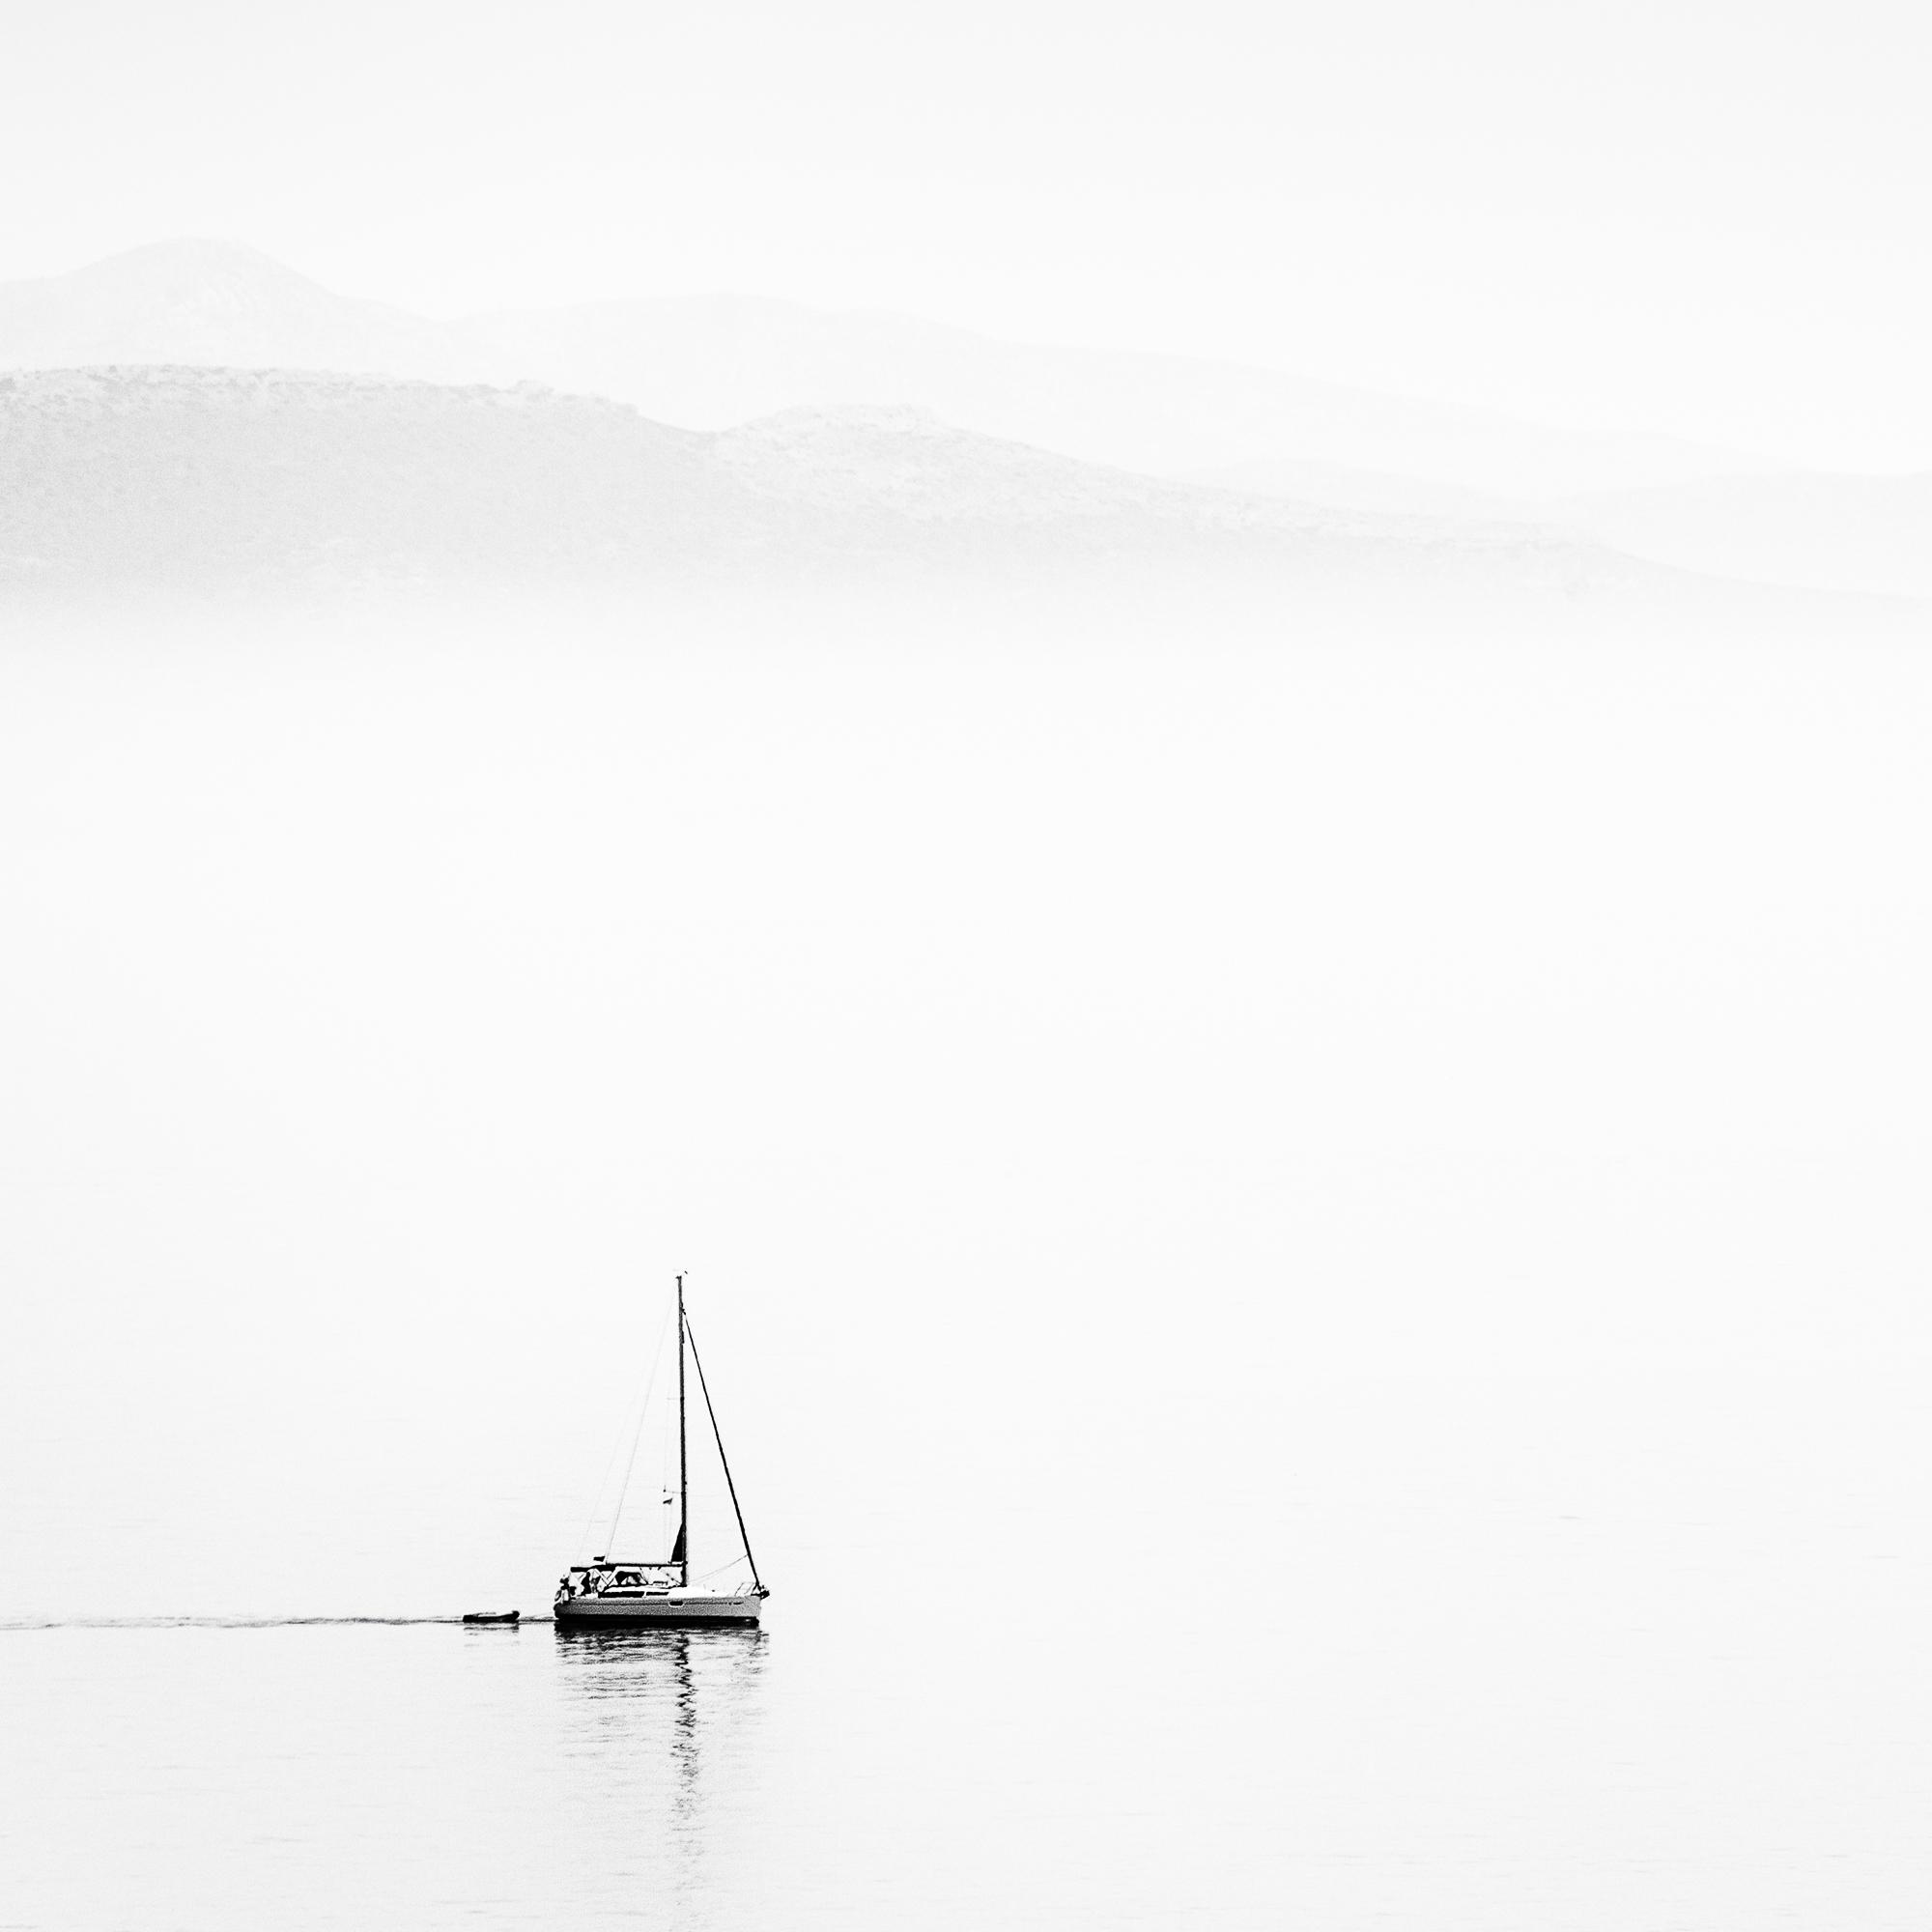 Kea-Sailboat at sea.jpg